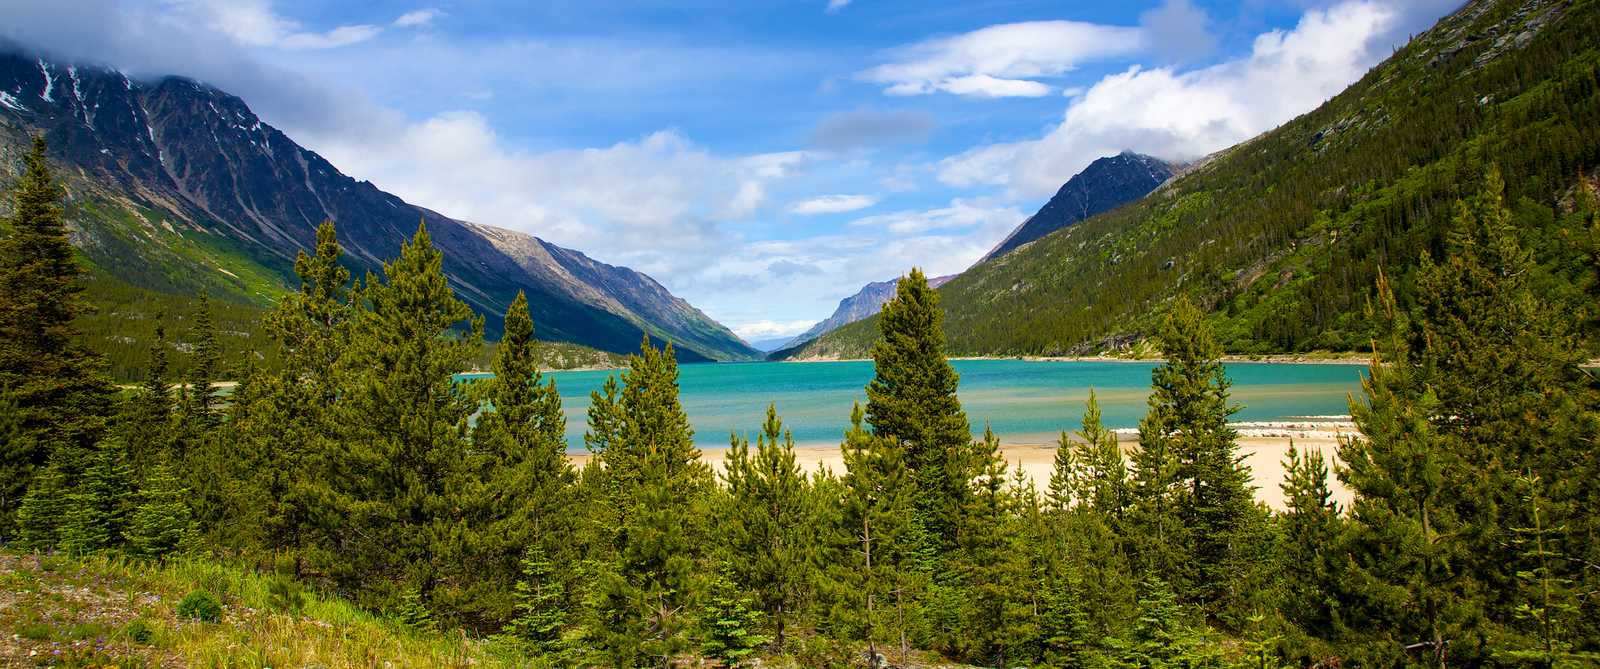 Lake Bennet in Yukon, Canda